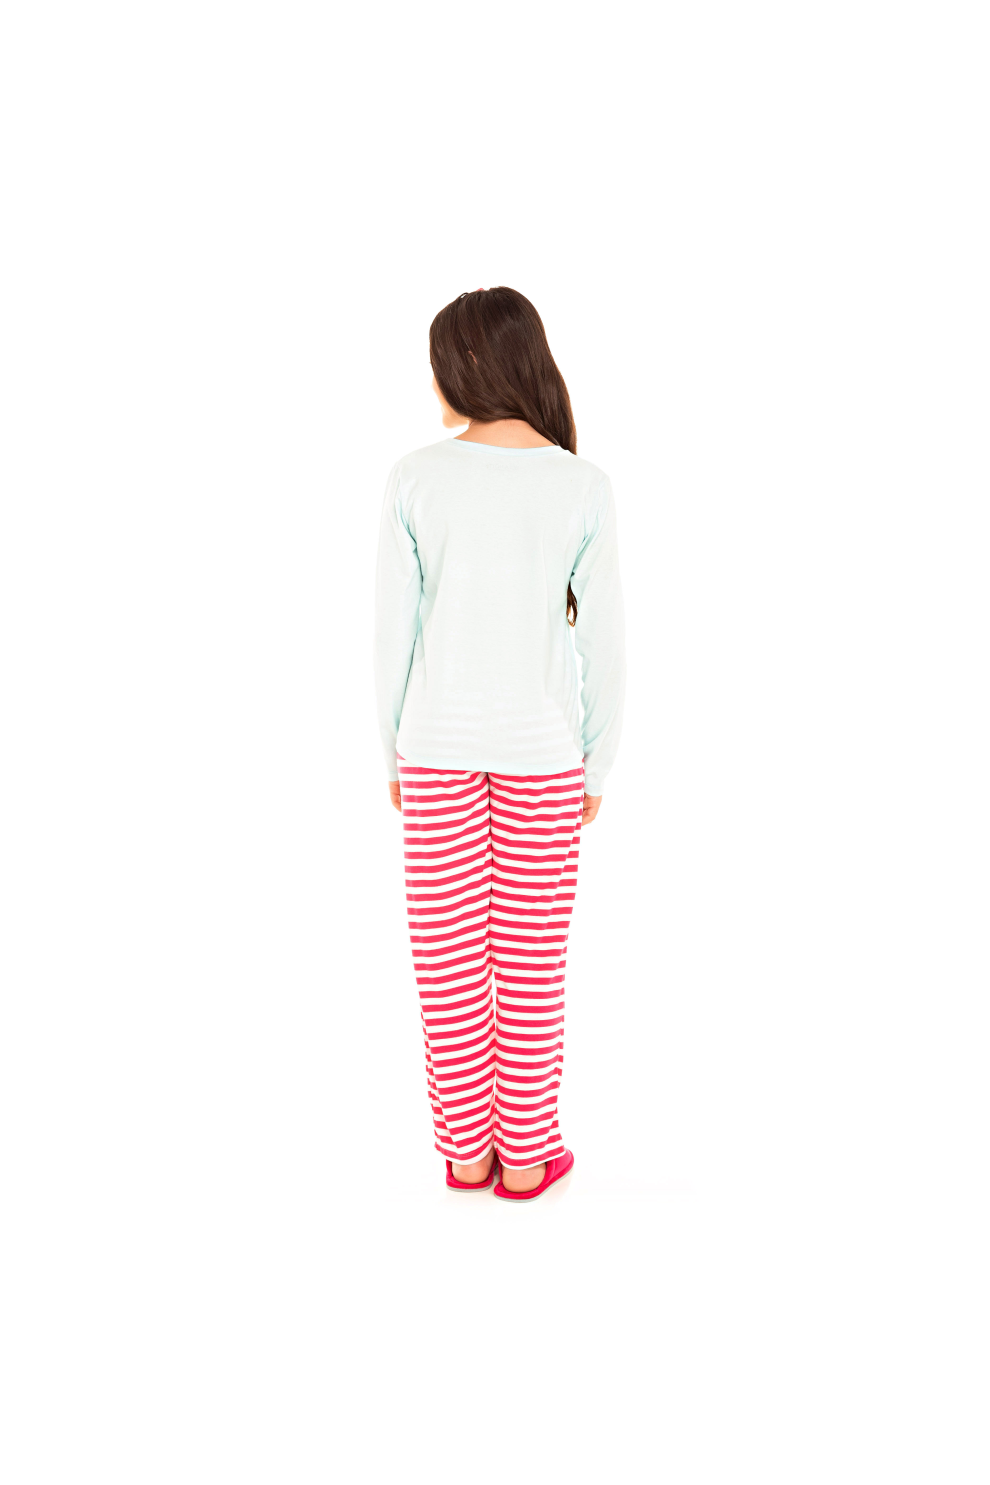 209/B - Pijama Juvenil Feminino Togheher  We  Are Better